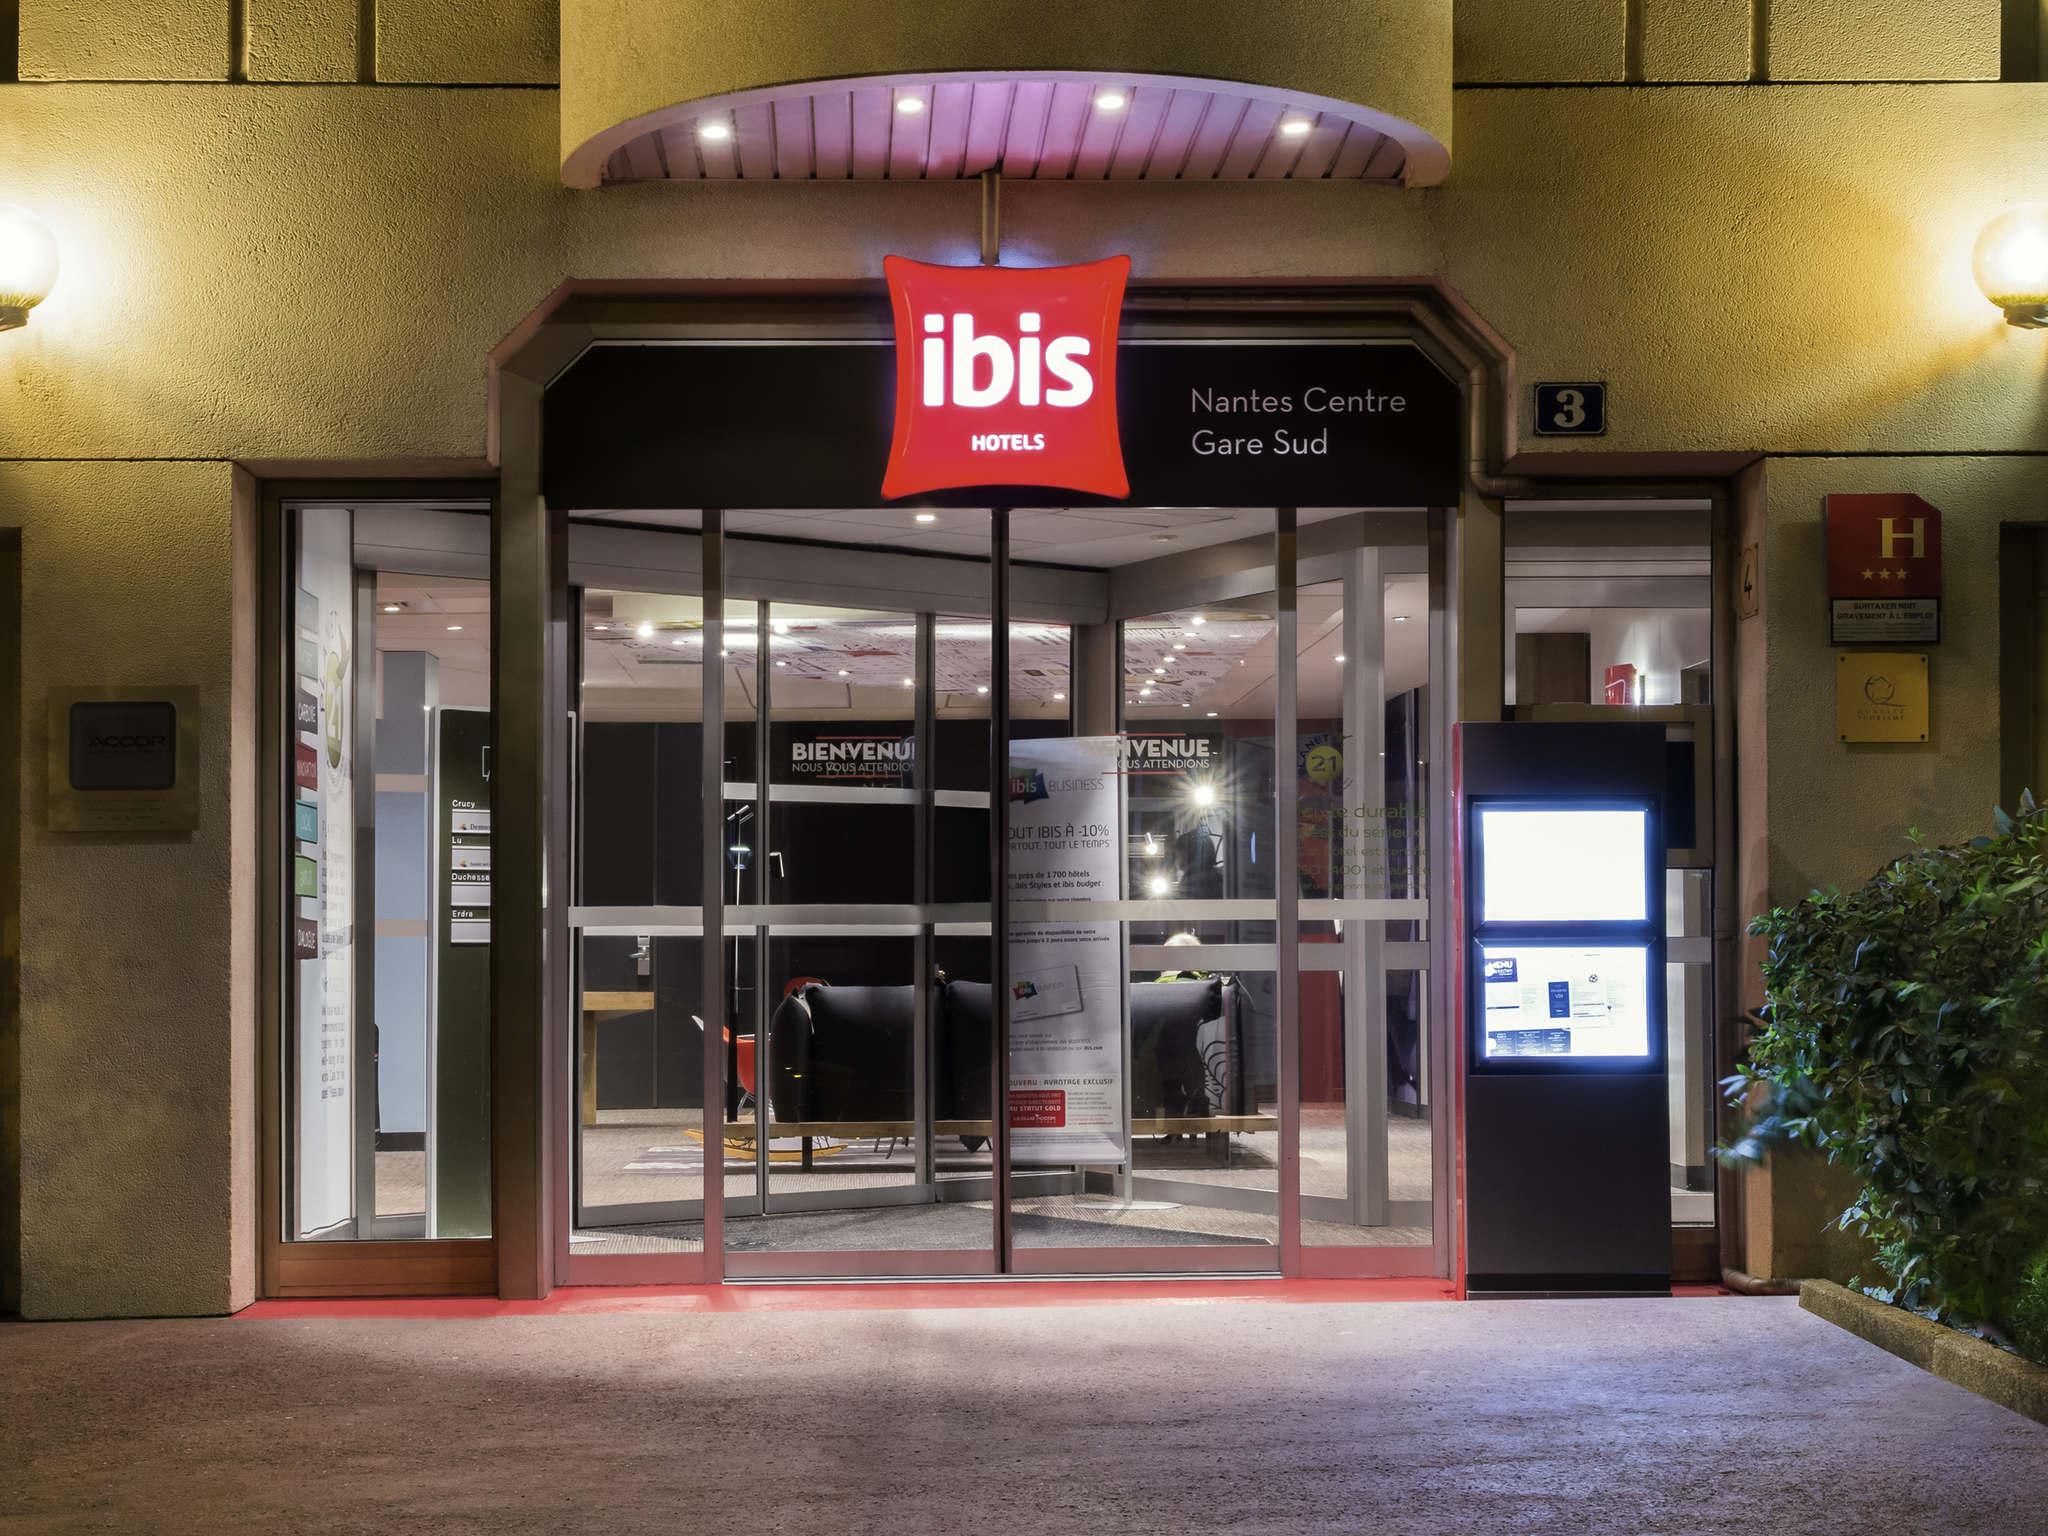 Hôtel - ibis Nantes Centre Gare Sud